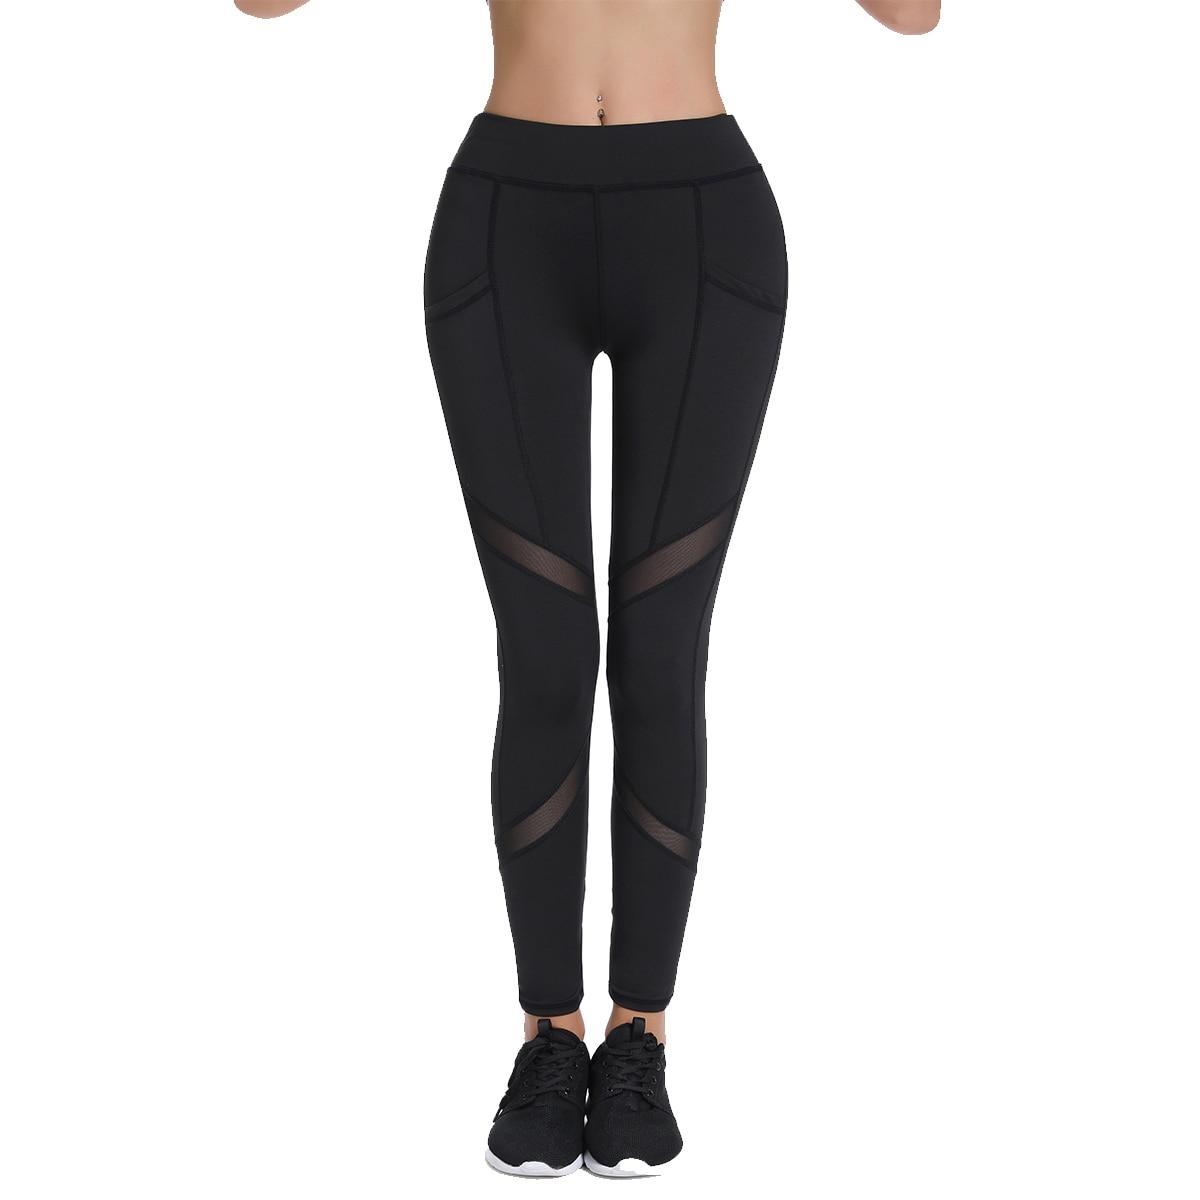 Women Ankle Length Plus Size High Elasticity Workout Leggings With Pockets Breathable Mesh Gym Sport Pant Black S-XXXL